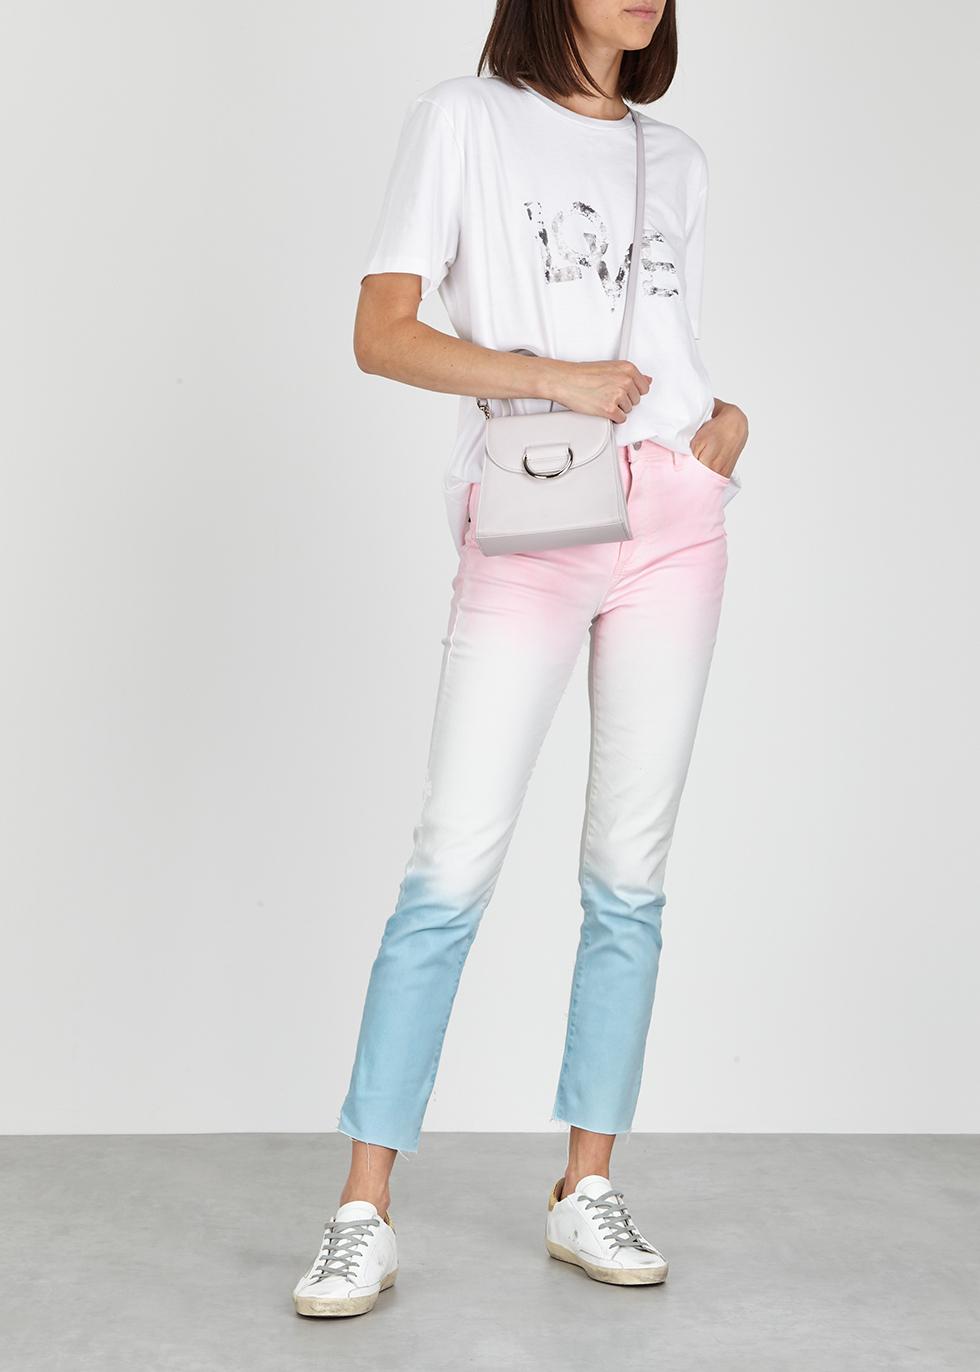 Harvey Nichols - The jeans edit